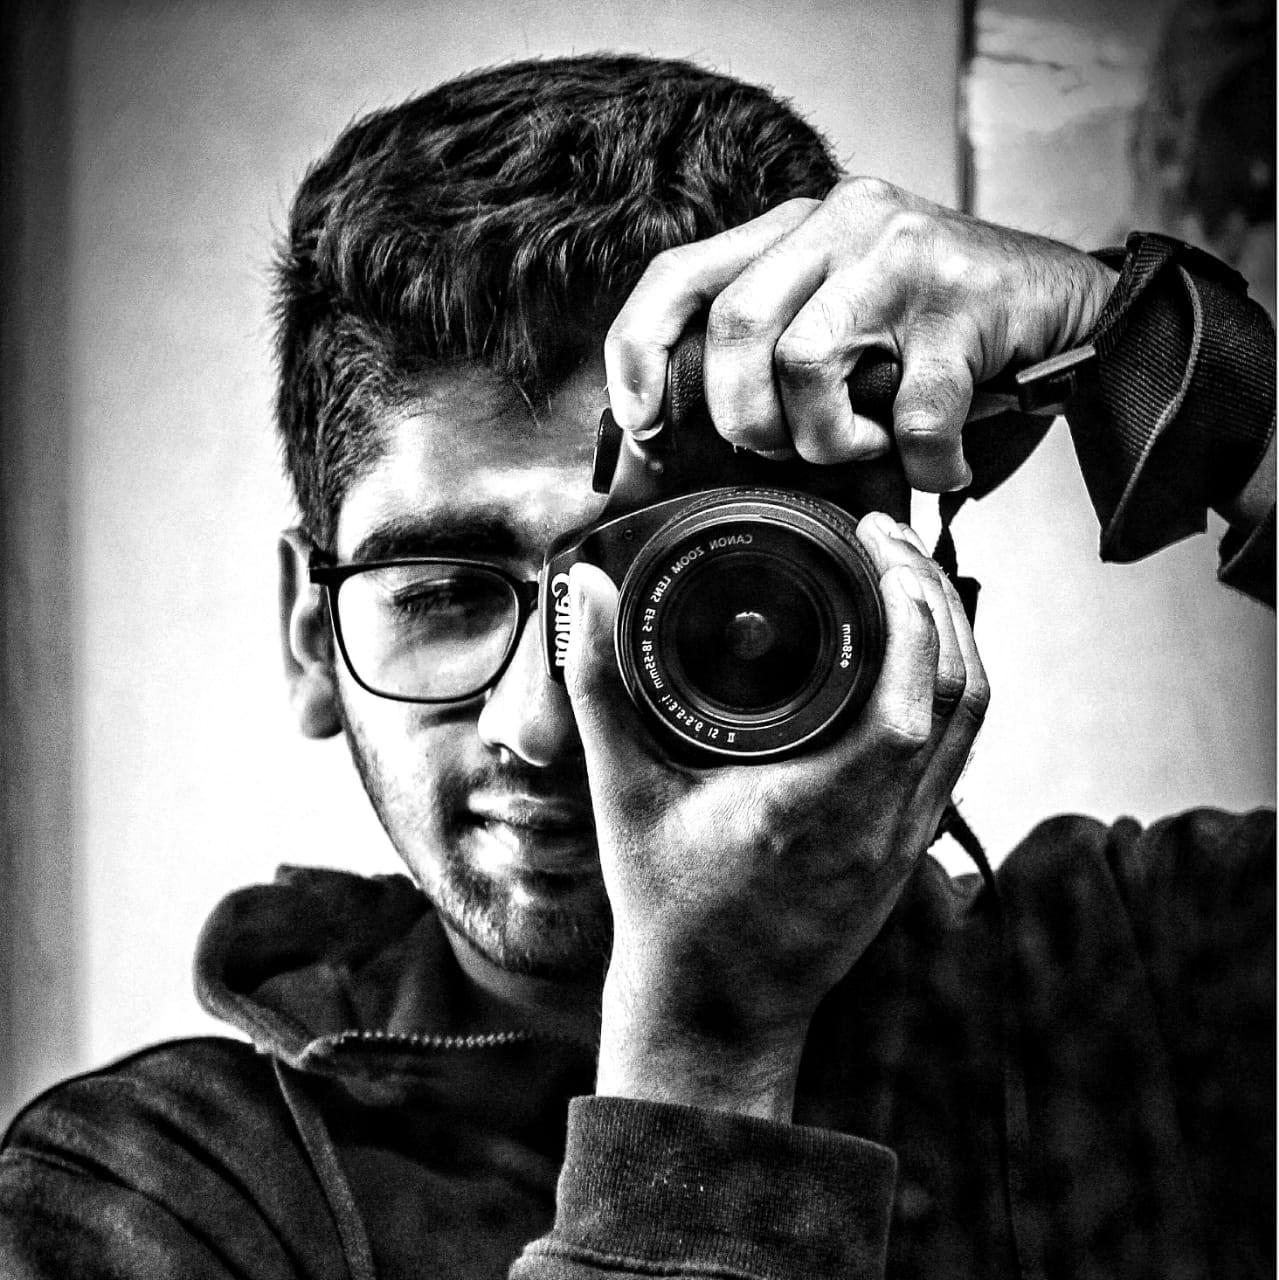 Go to Aditya Sethia's profile